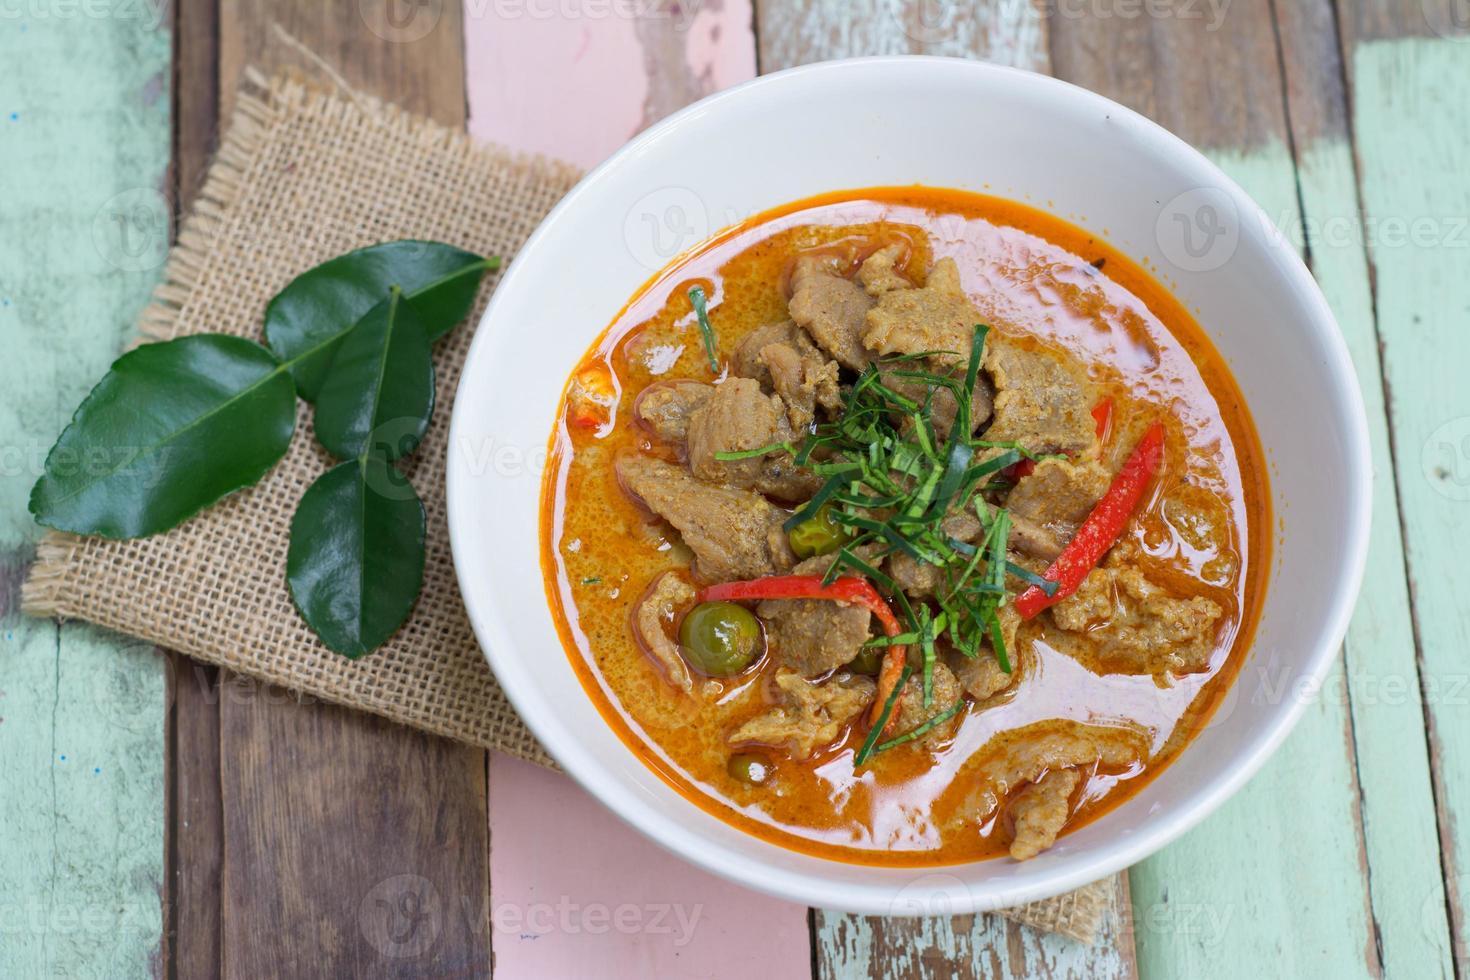 pasta di curry rossa saporita con carne di maiale foto